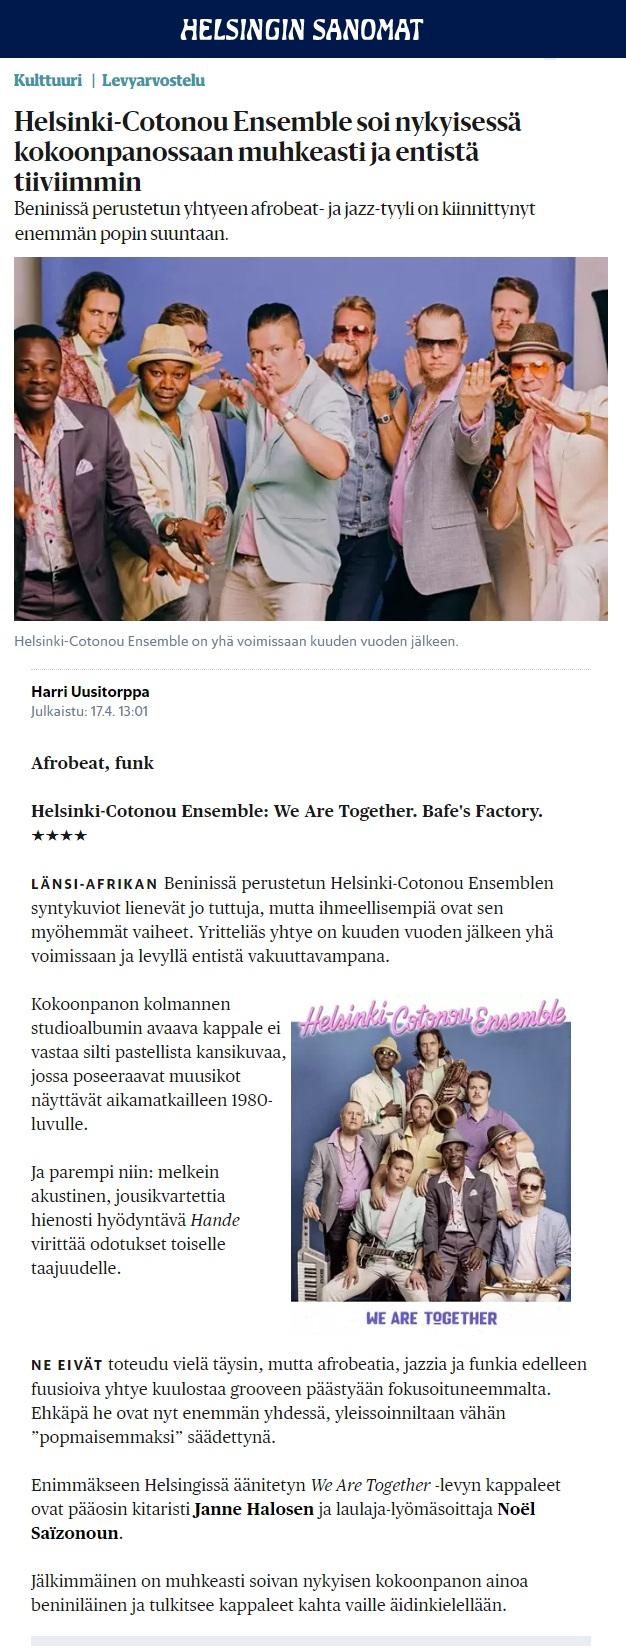 Helsingin Sanomat (Finland),17.4.2018